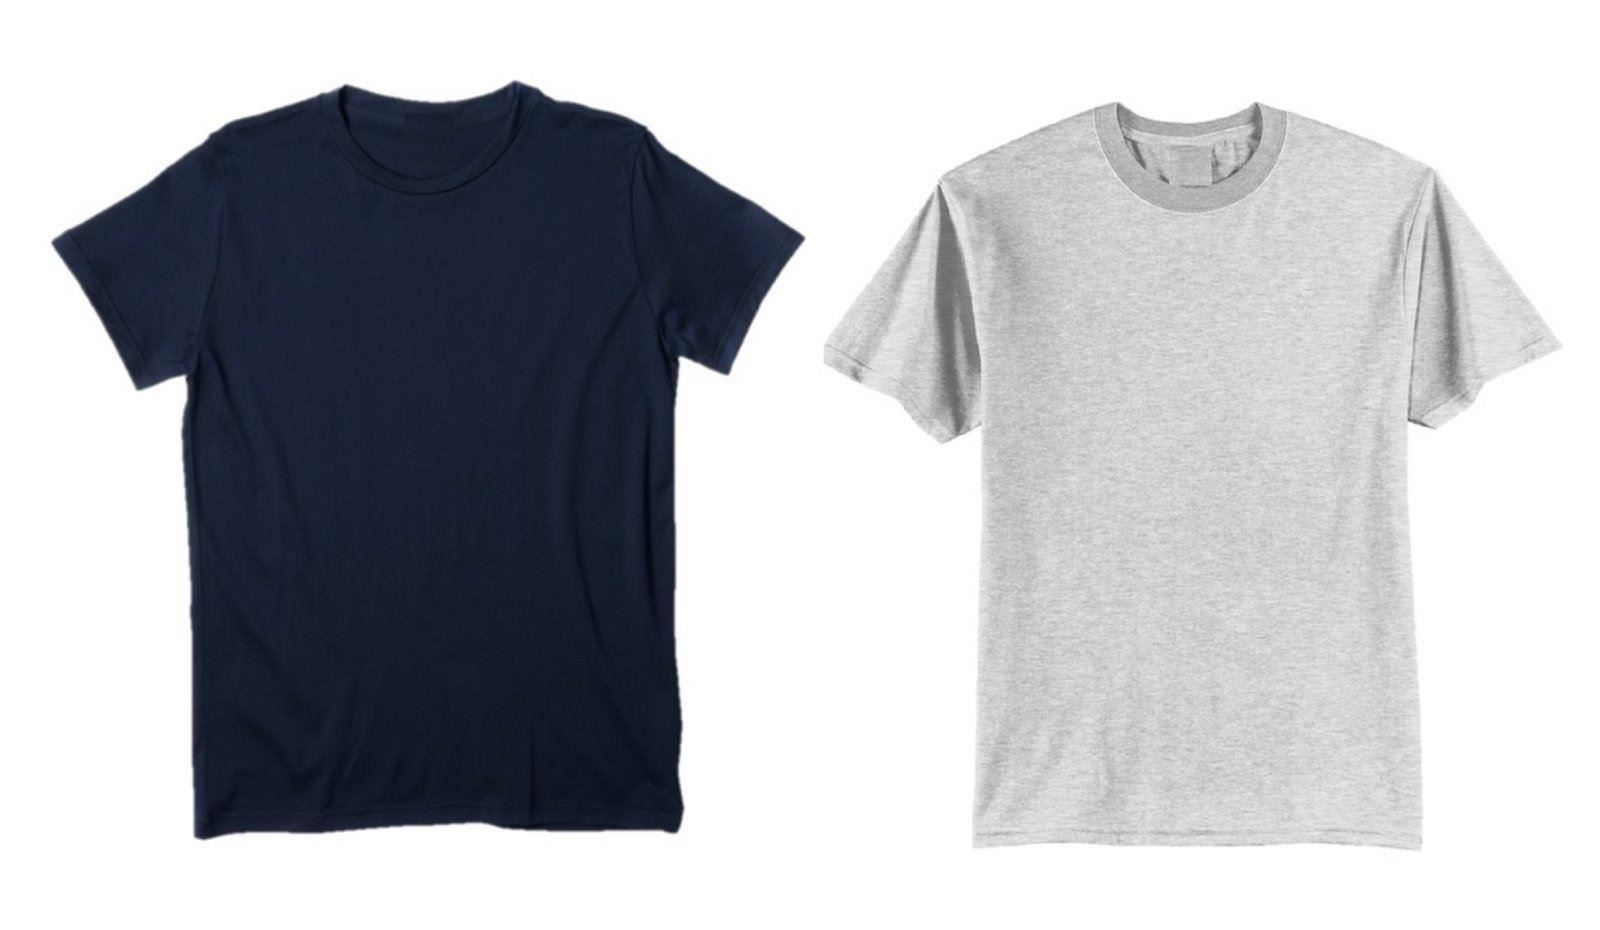 Big mens t shirt tee polo king size 3xl 4xl 5xl 6xl twin for Mens t shirts 4xl